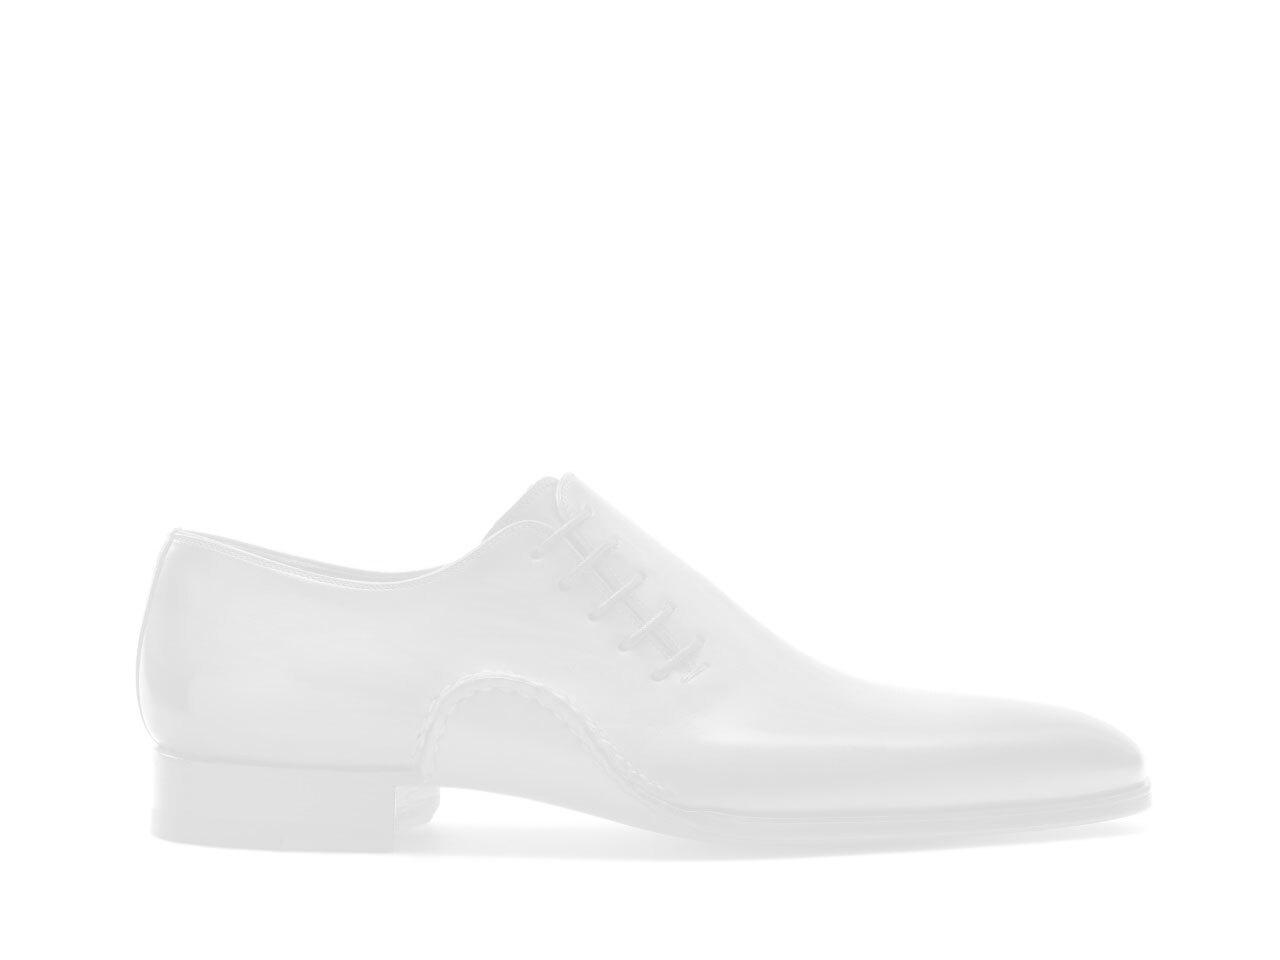 Sole of the Magnanni Jefferson Black Men's Oxford Shoes